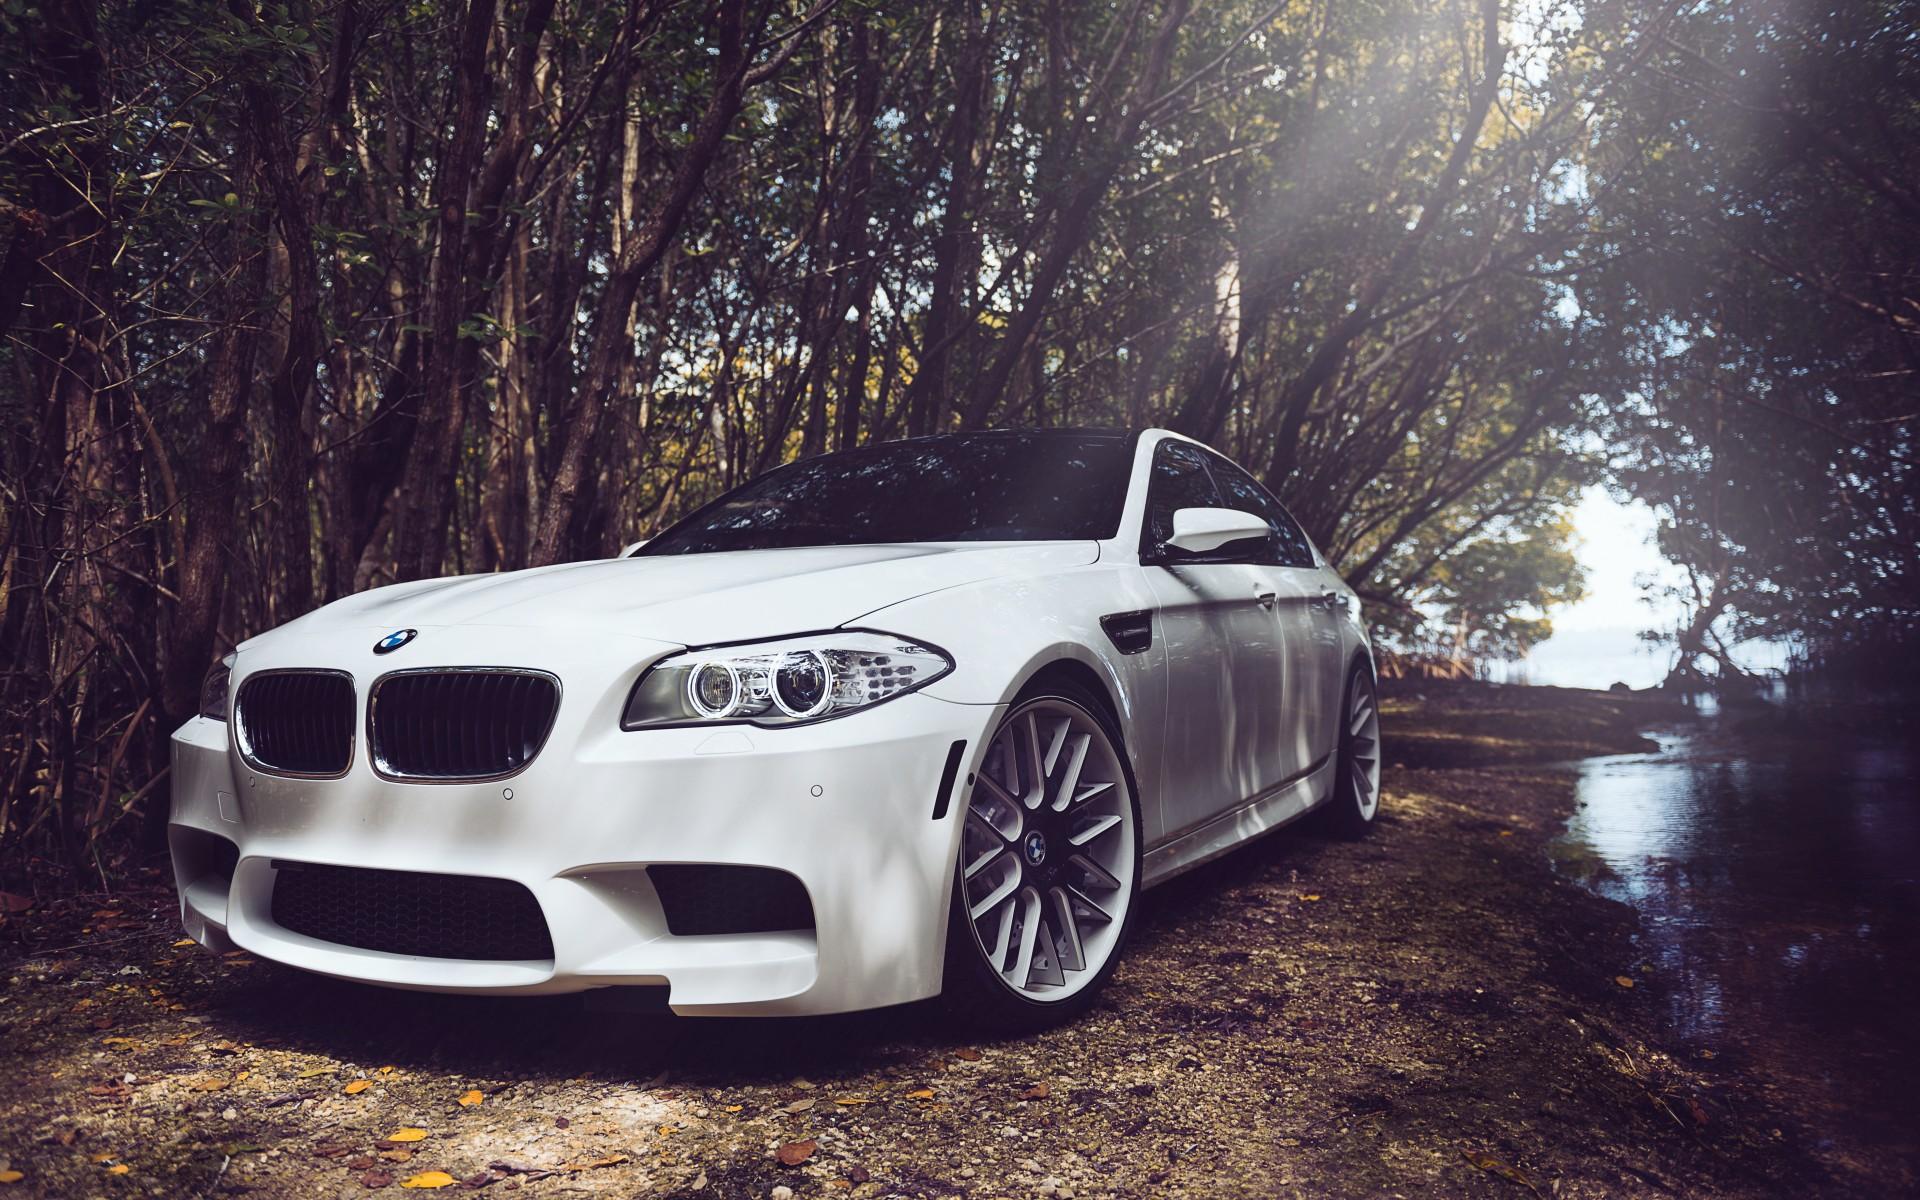 BMW M5 HD Wallpaper Background Image 1920x1200 ID434729 1920x1200